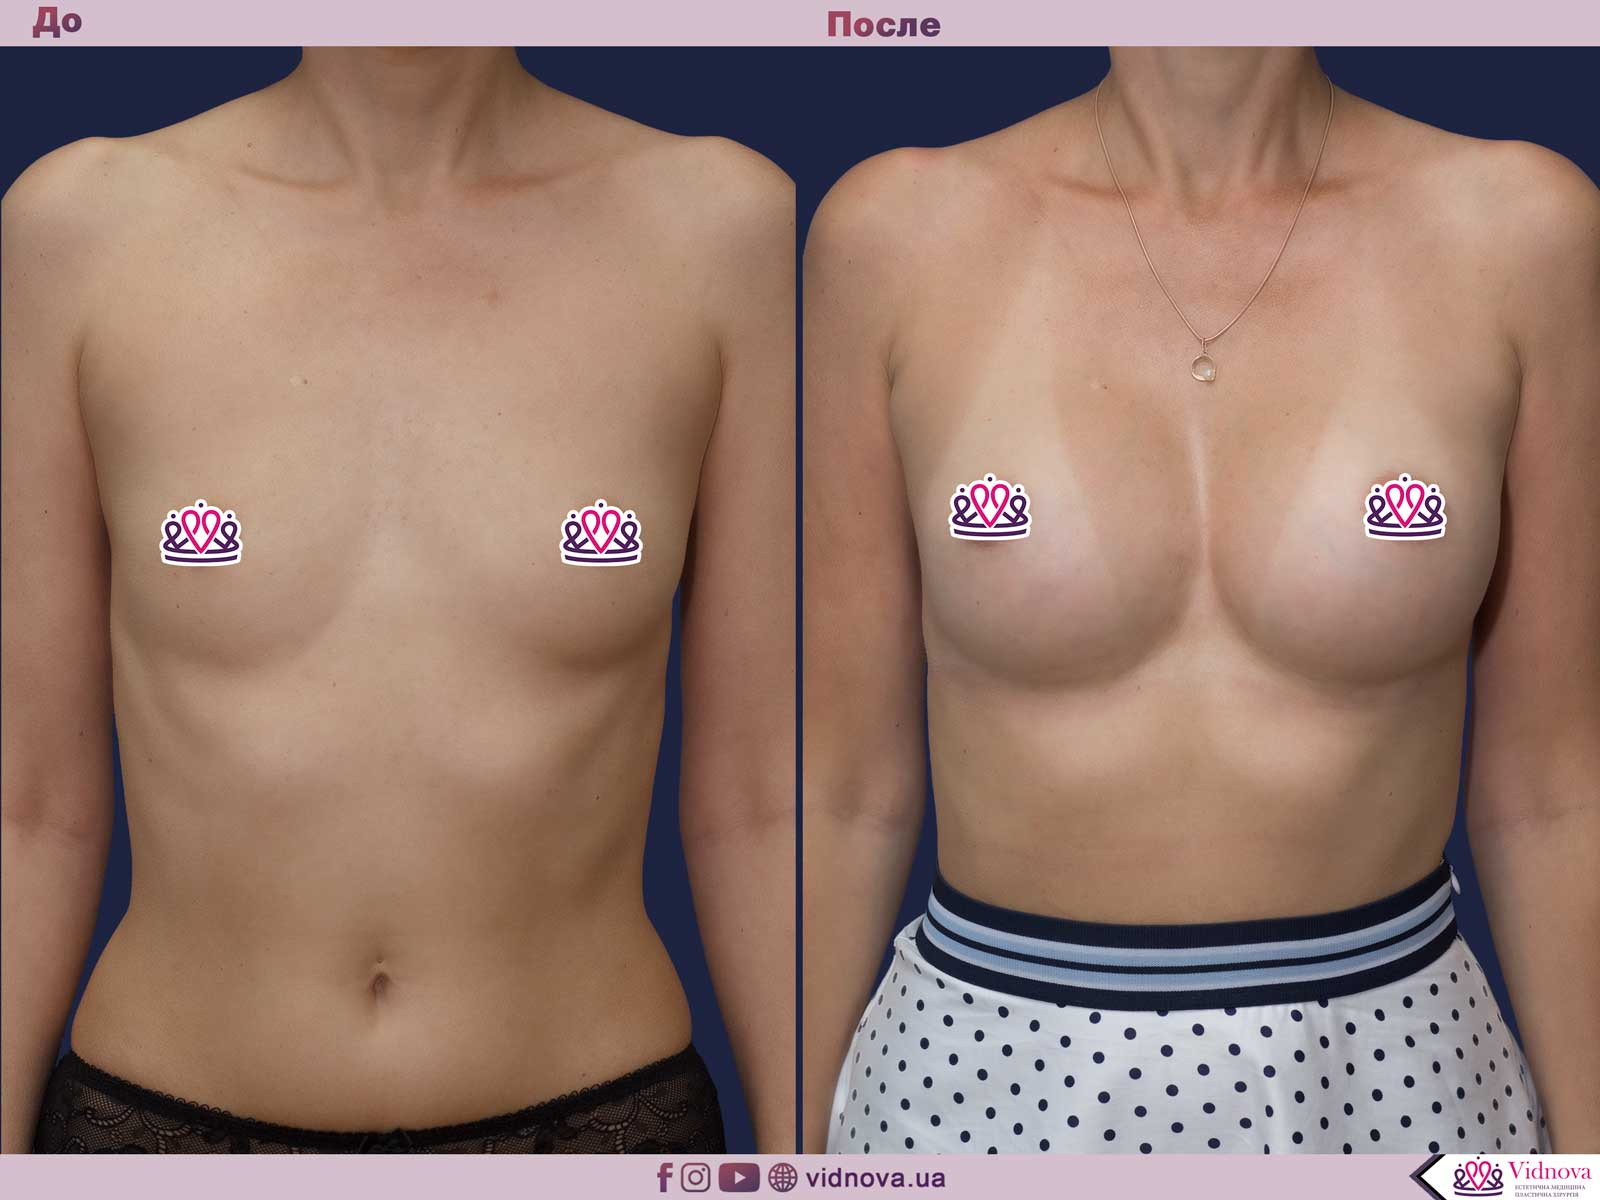 Увеличение груди: Фото ДО и ПОСЛЕ - Пример №59-1 - Клиника Vidnova